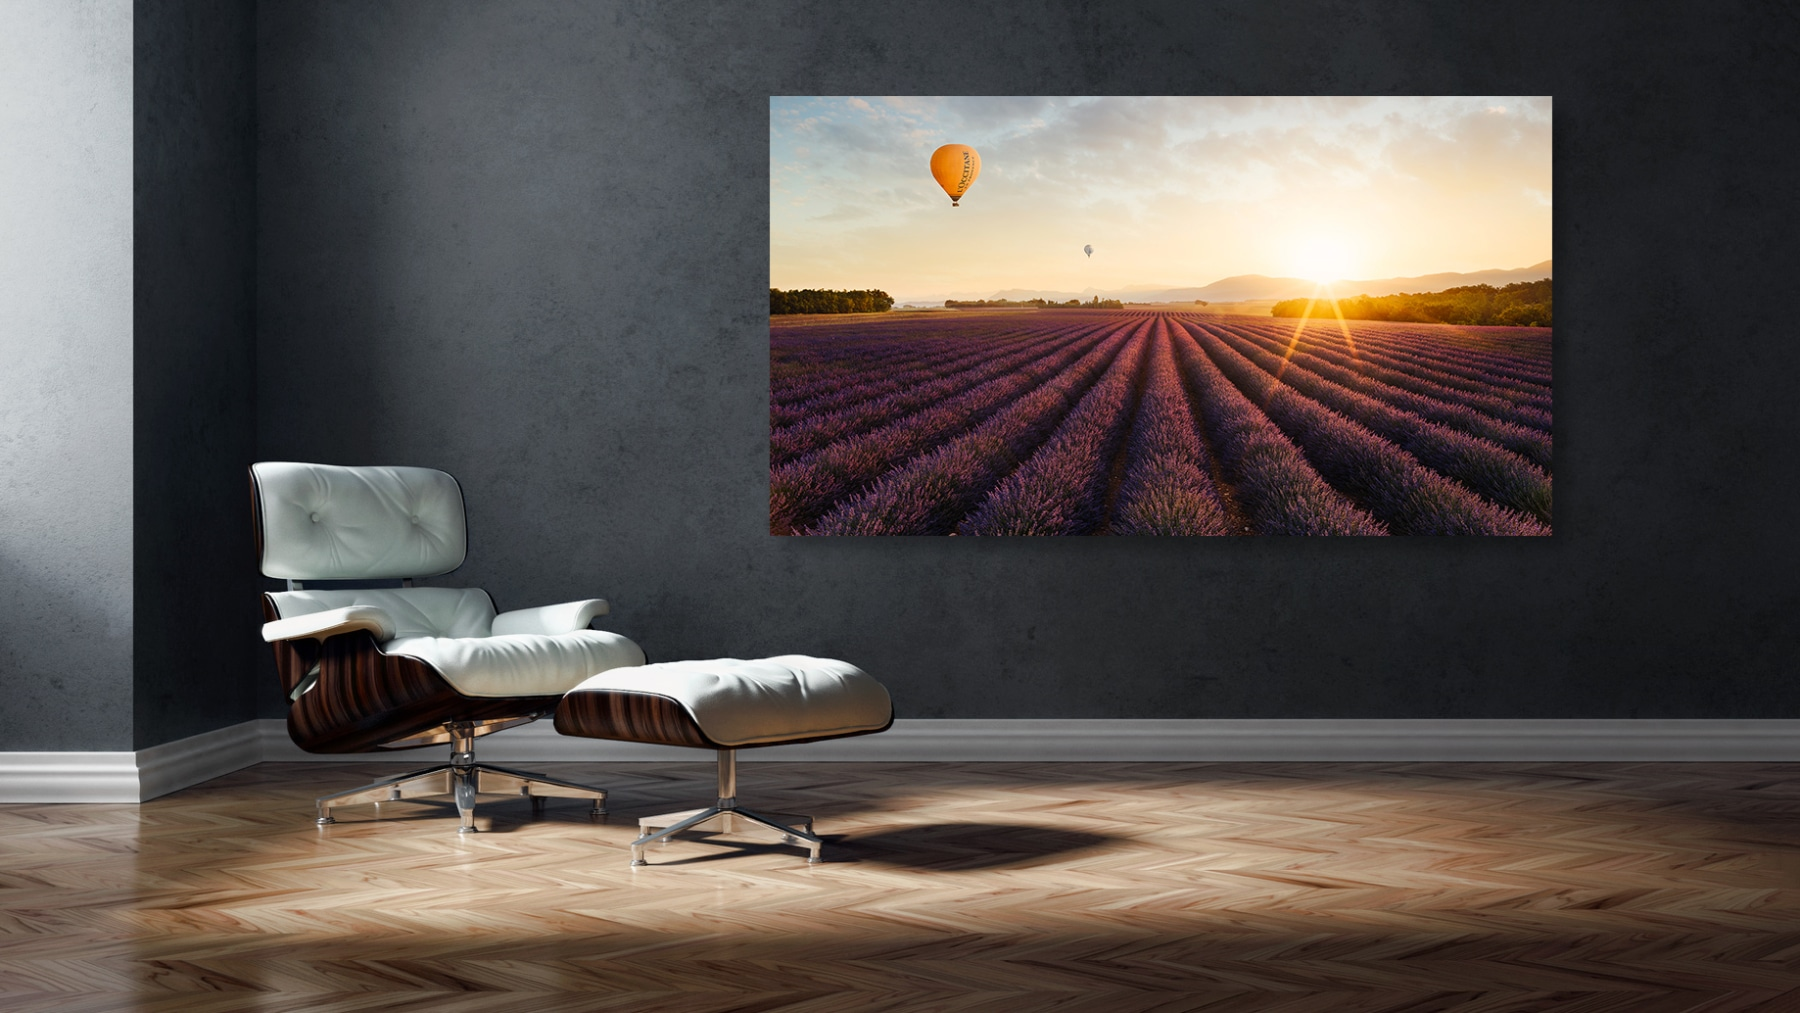 Frankreich - Provence - Valensole - Sonnenaufgang - Ballonfahrt